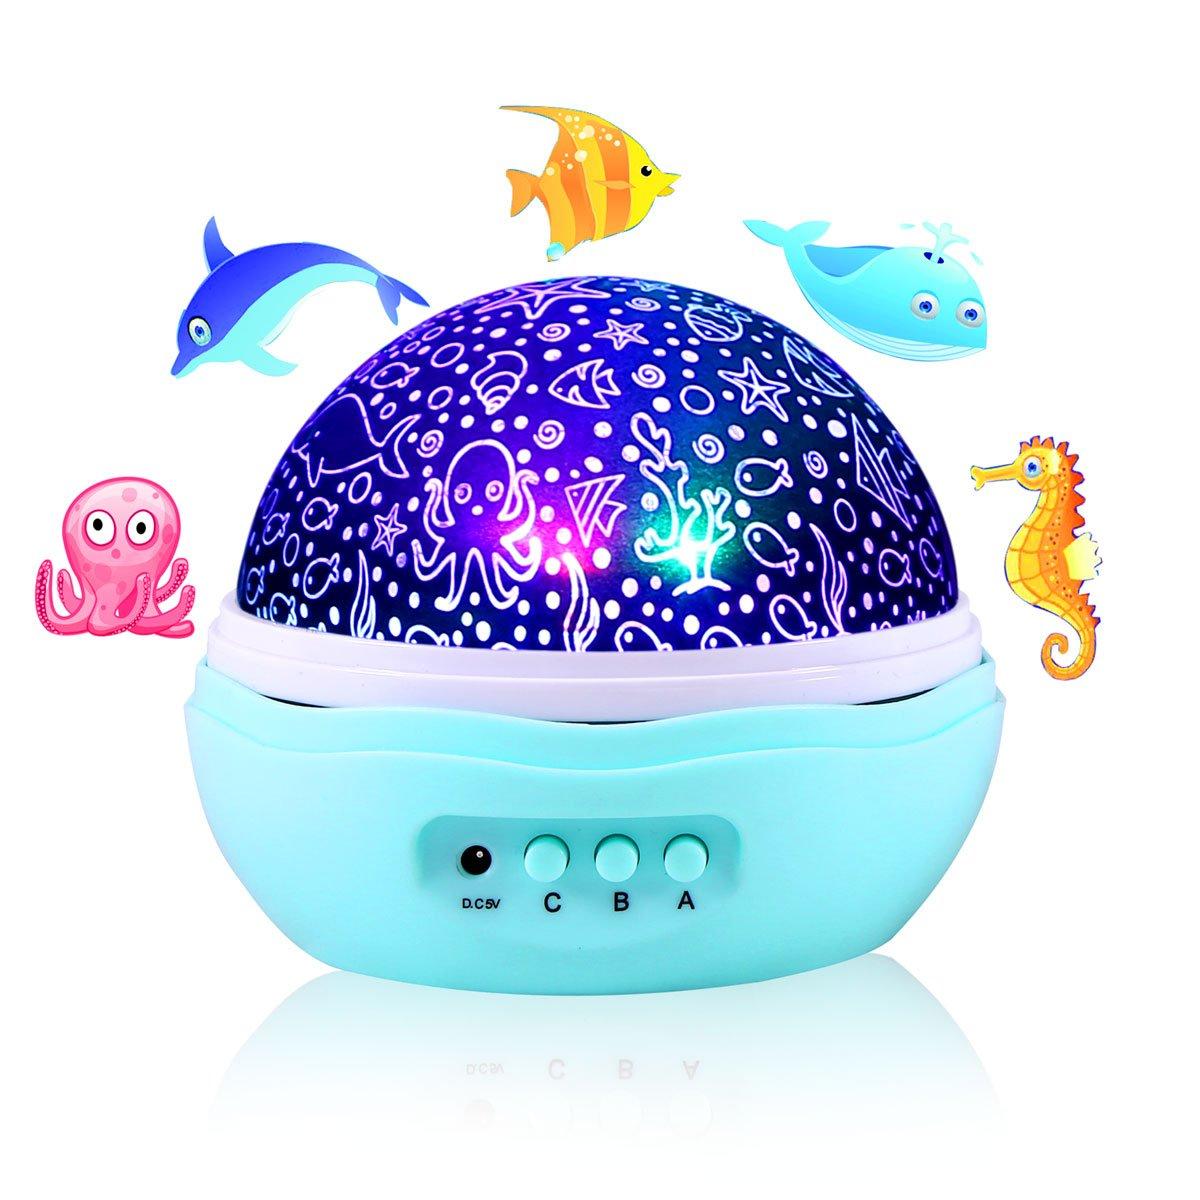 LEDプロジェクタナイトライト JL-PL-02 B074GLSVNZ 13746 Undersea World Projector Undersea World Projector